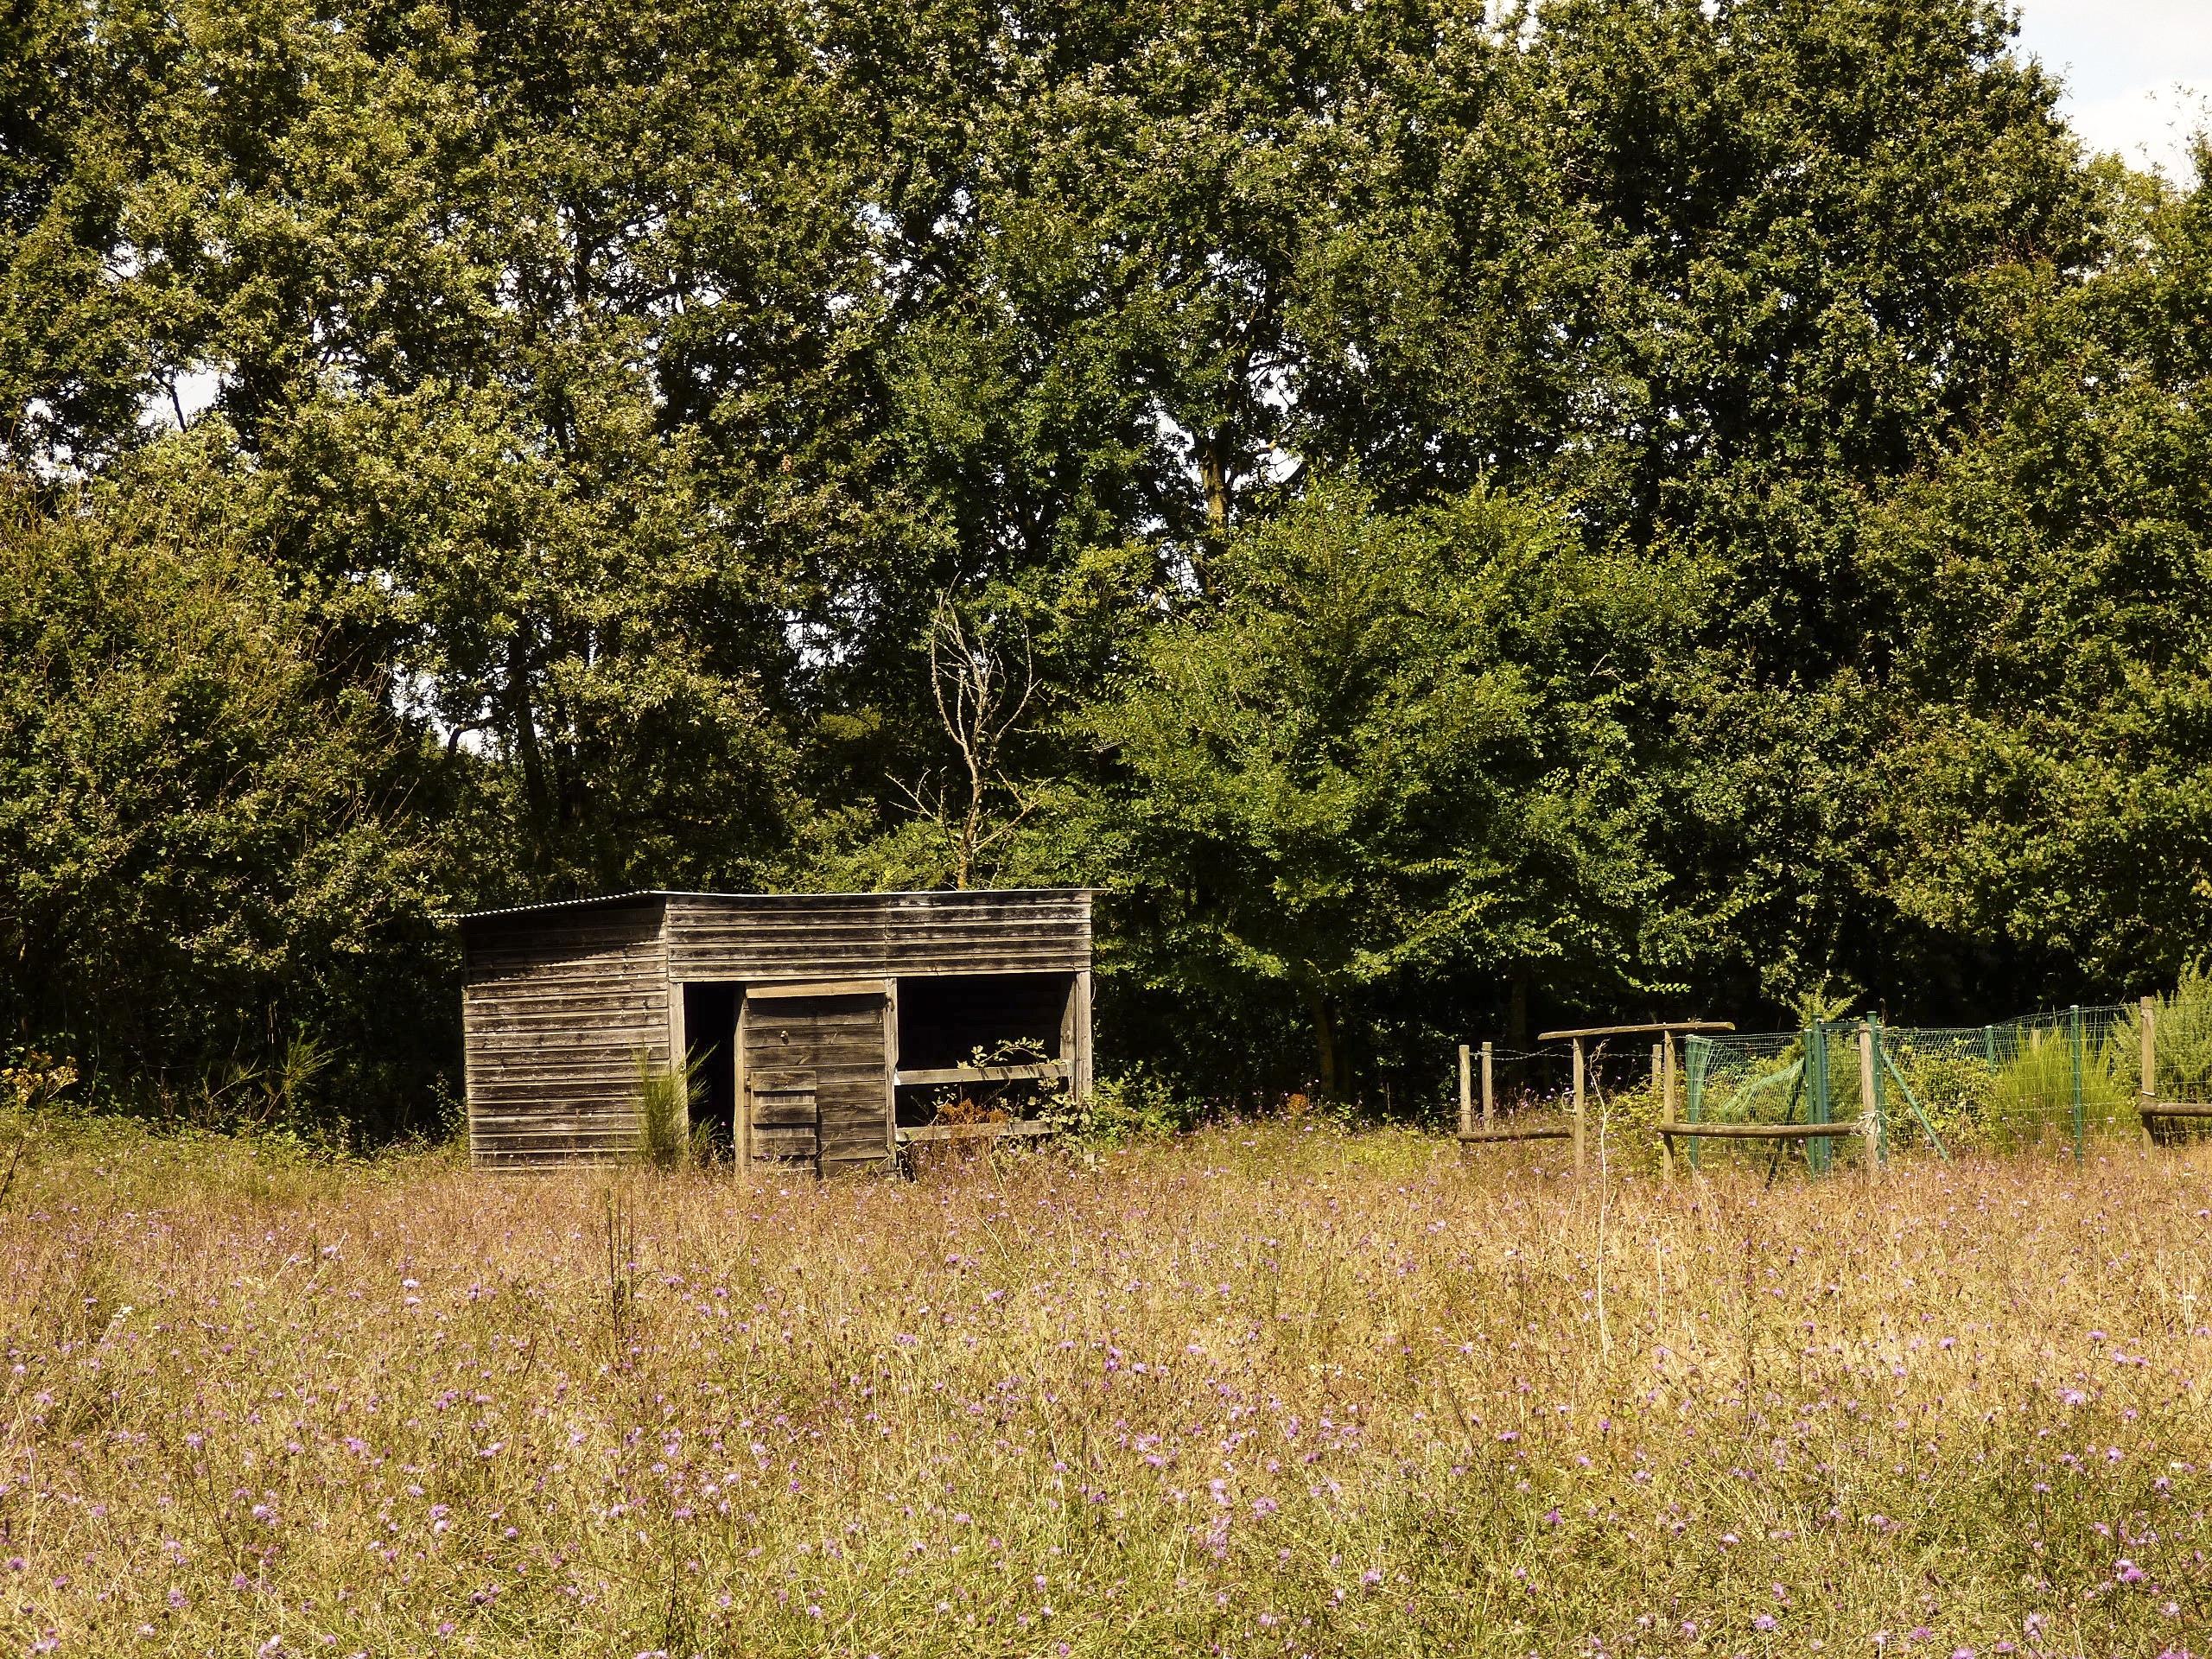 Plant covered shack photo